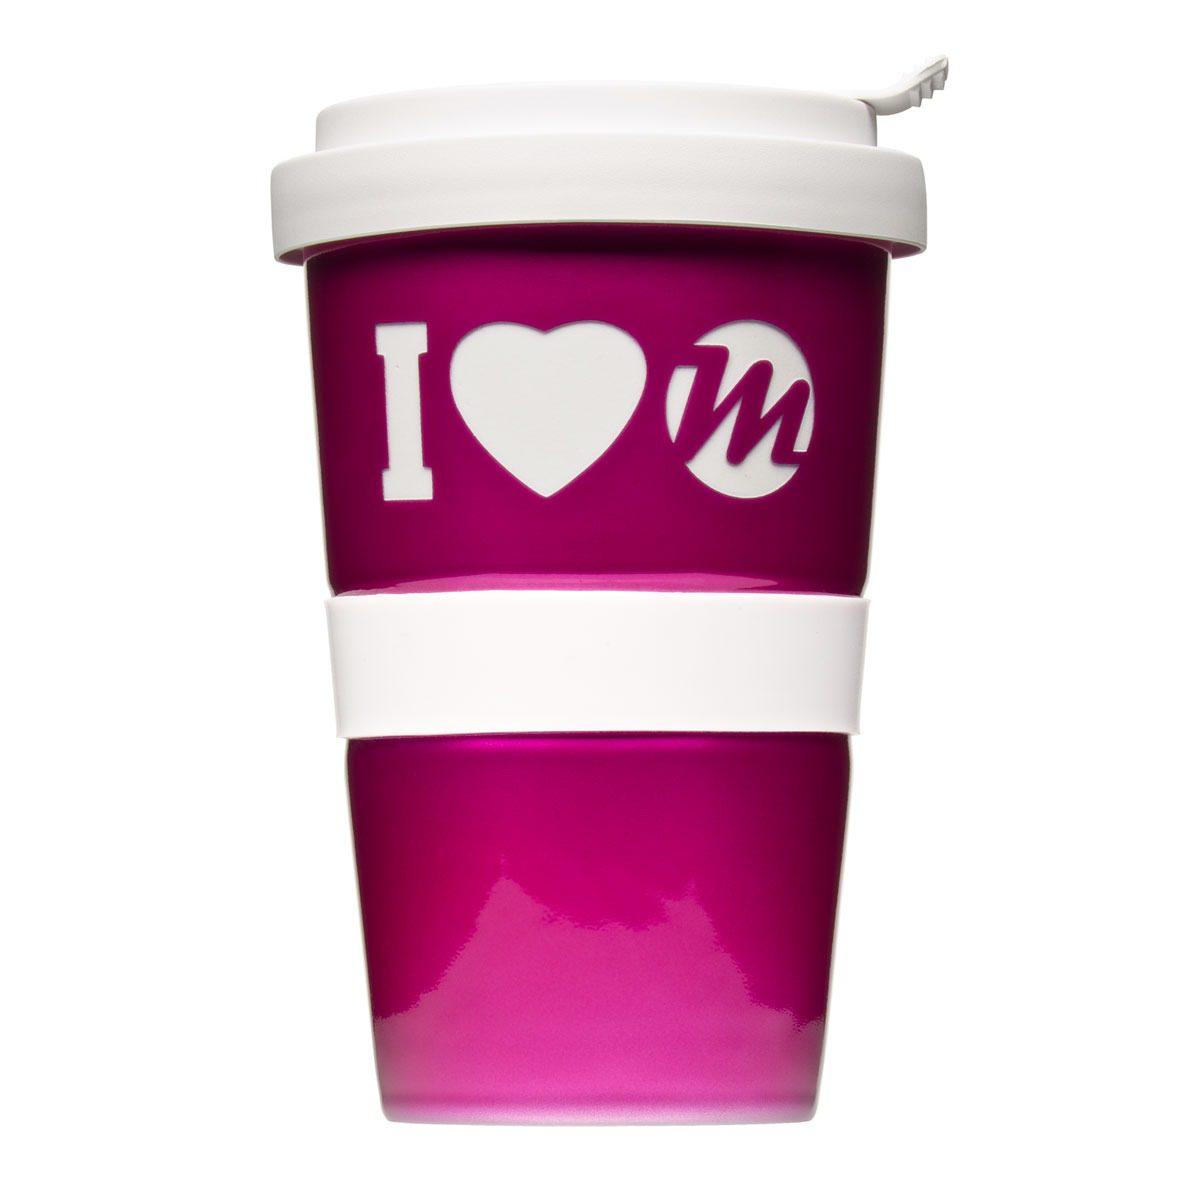 Coffee to Go mug with logo and Metalli look - Mahlwerck porcelain